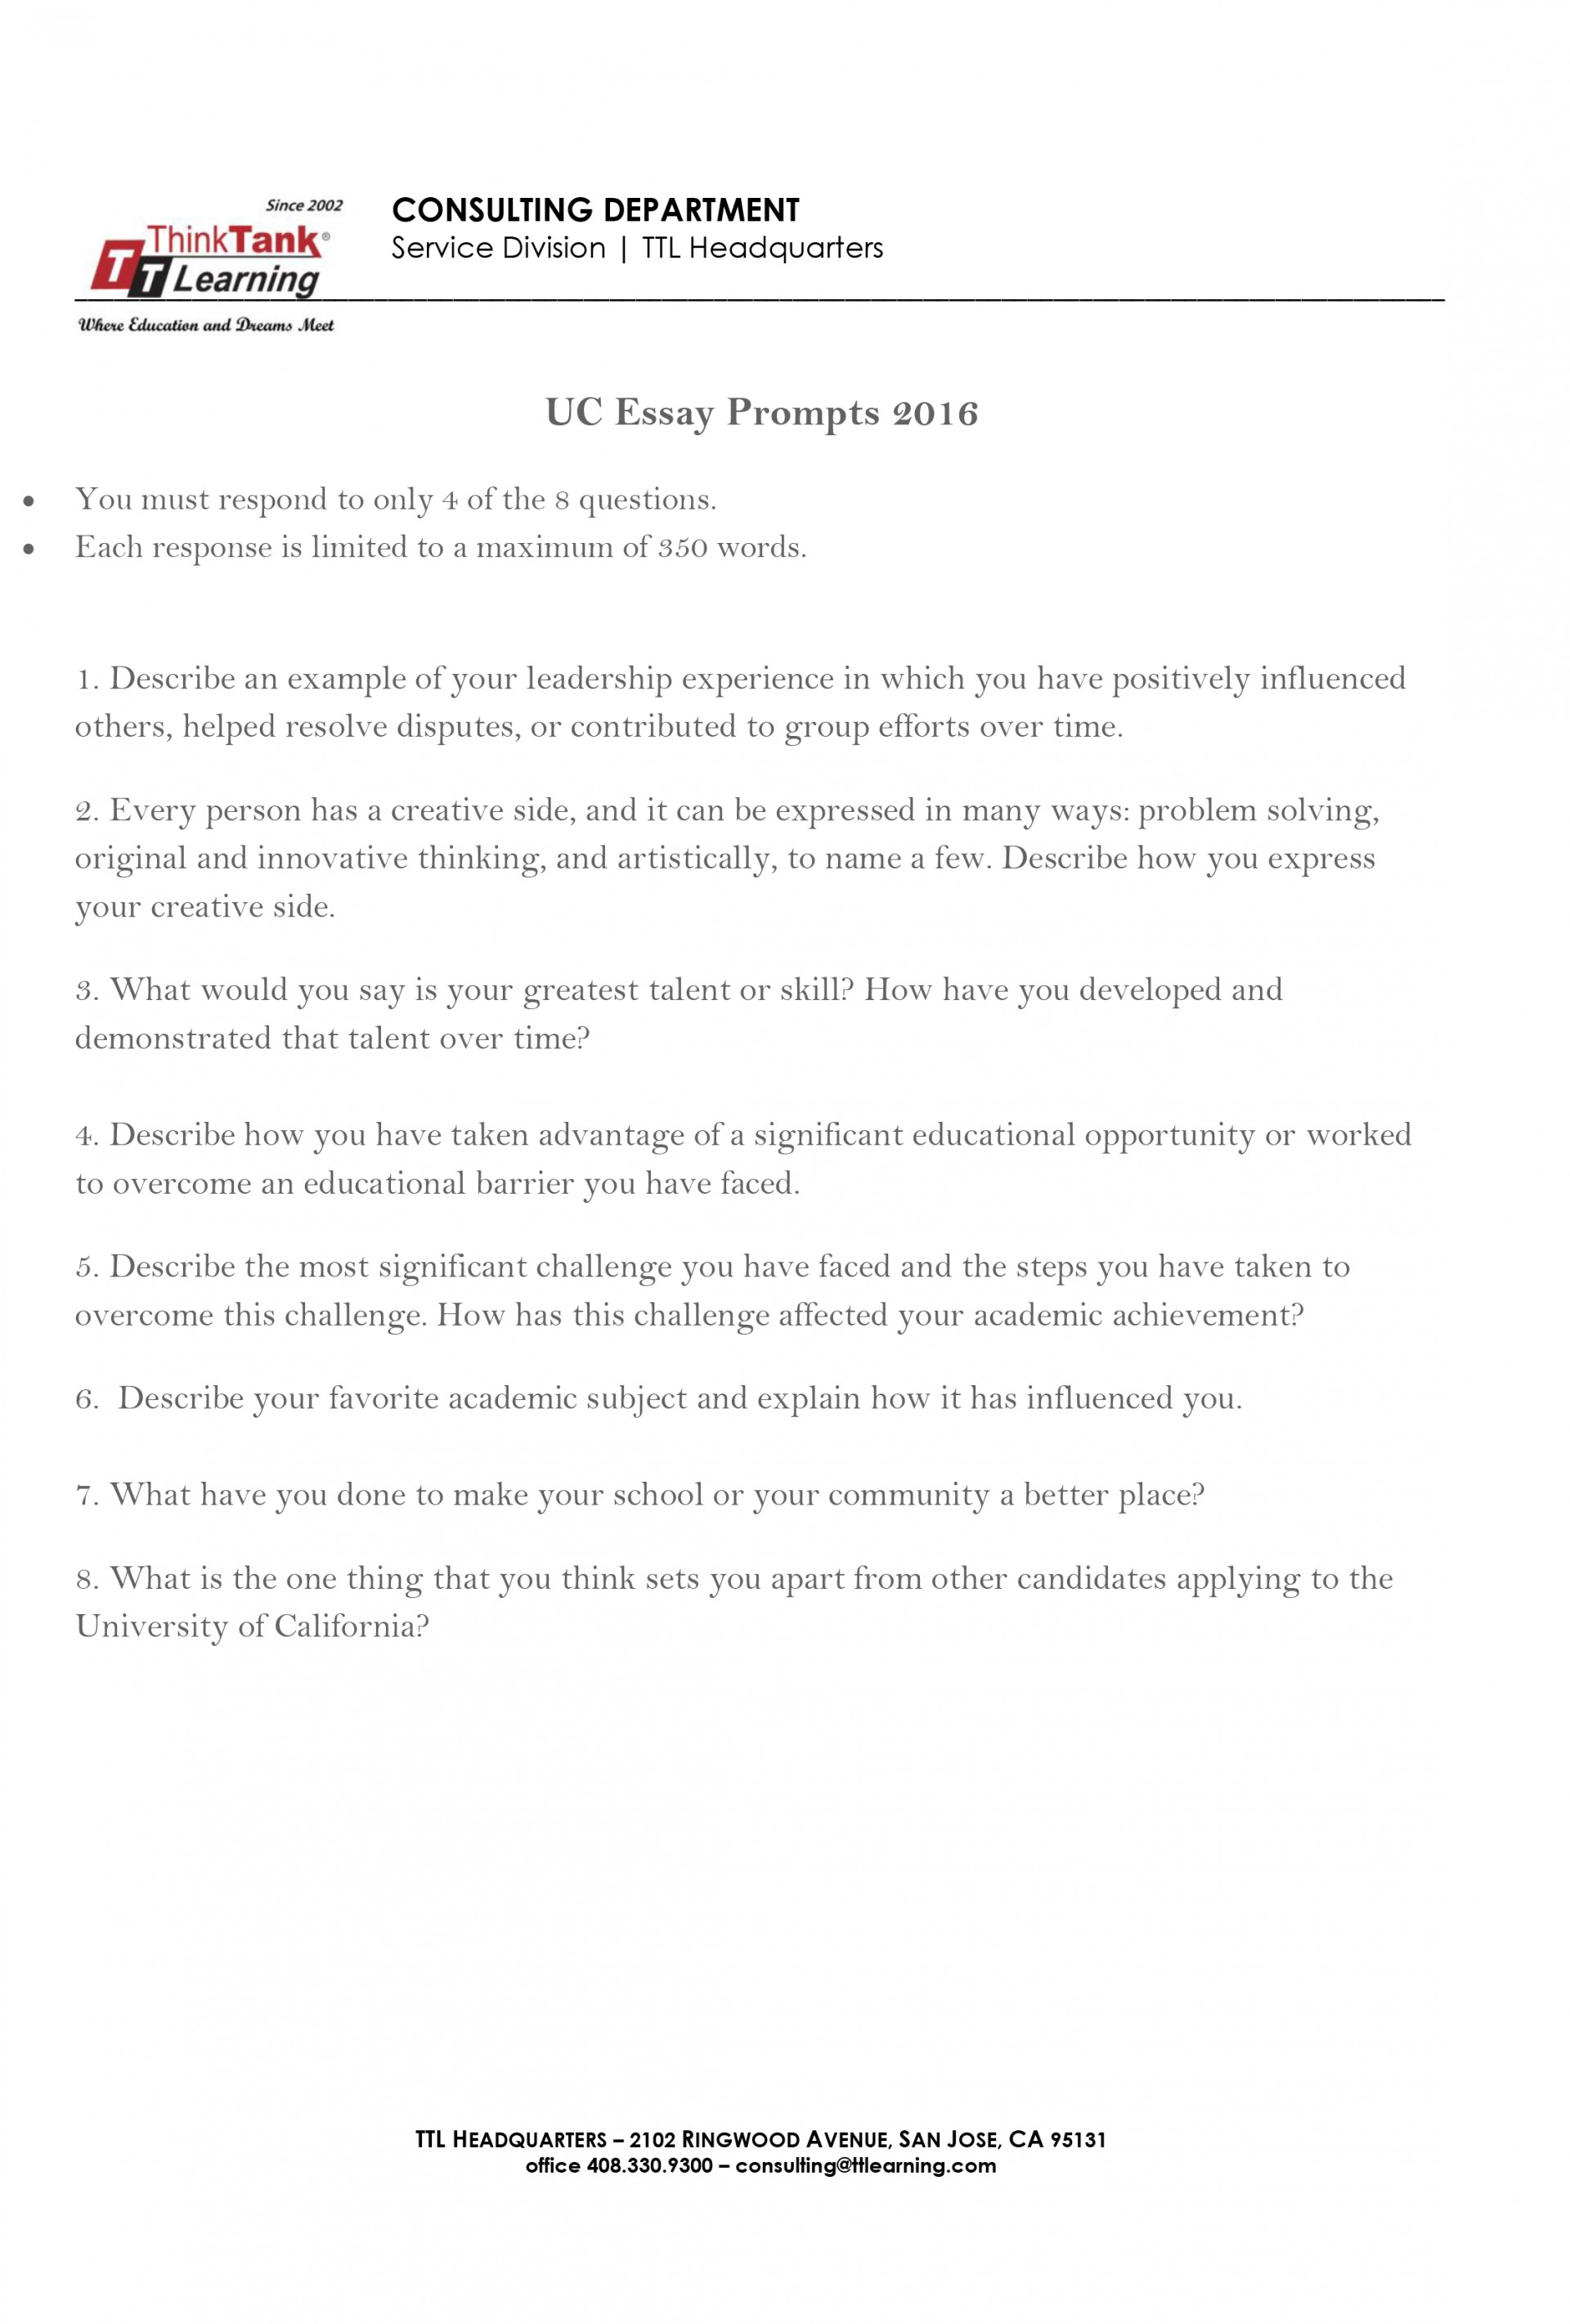 017 Ucla Essay Example Uc Prompts 2016 2 Frightening Alumni Scholarship 17 Mba Tips